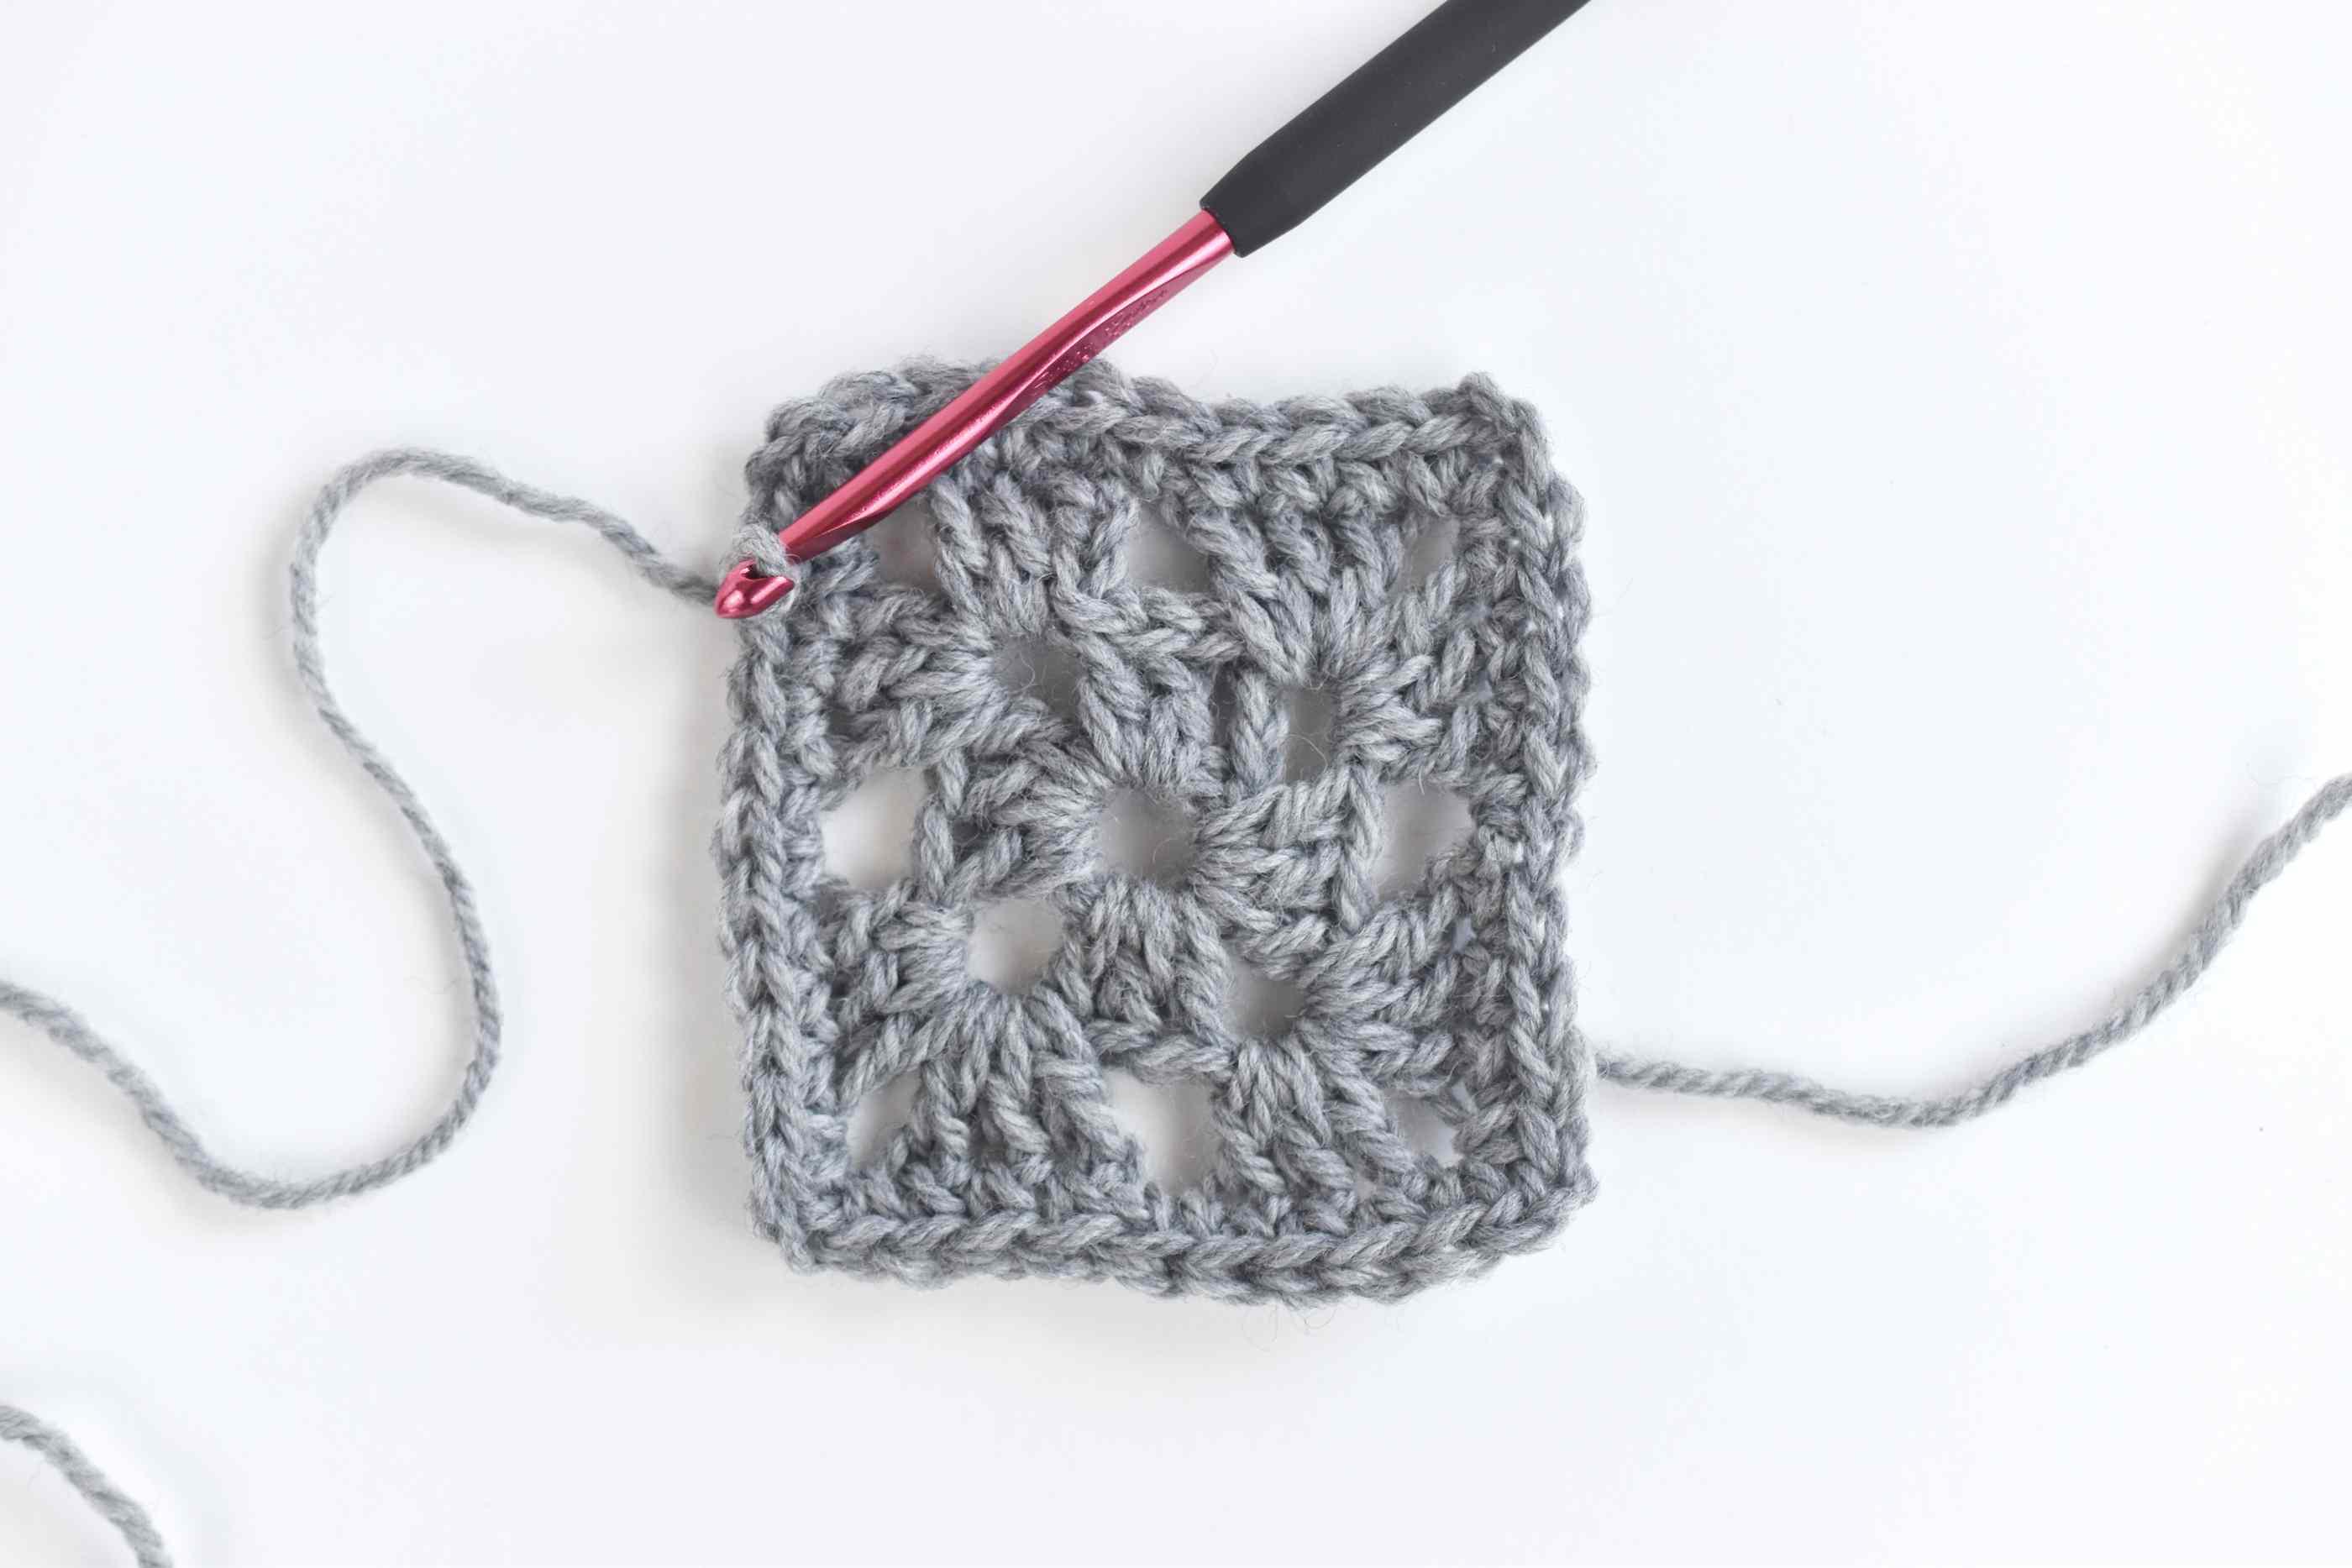 crochet granny square diagram mitsubishi car aircon wiring easy pattern round three